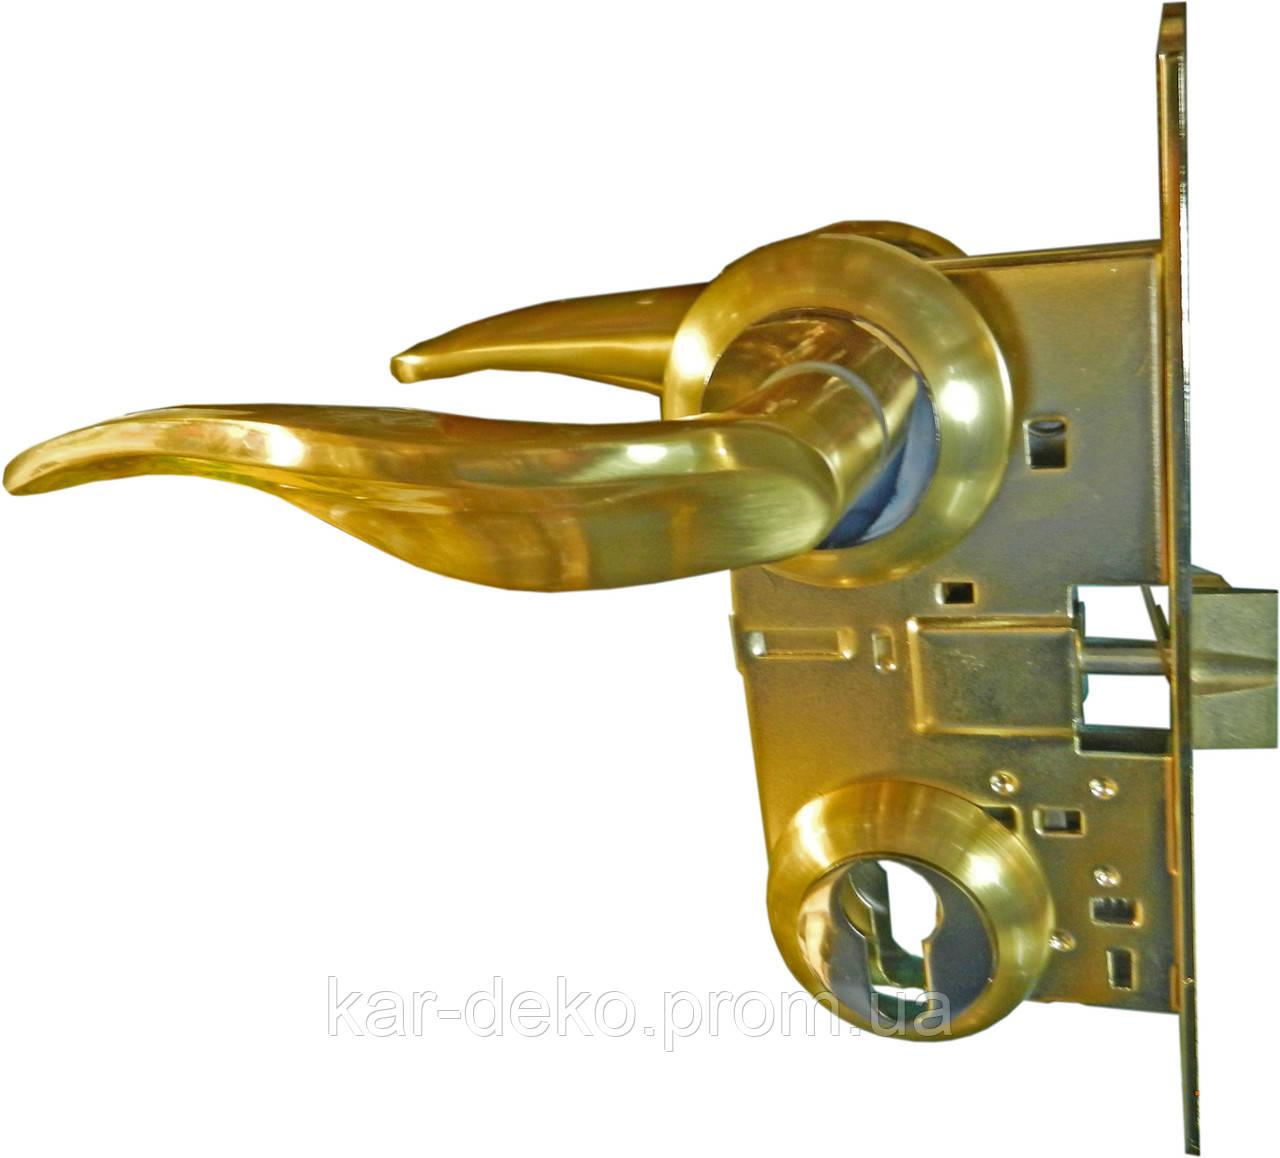 Дверная ручка межкомнатная с замком Mangoose